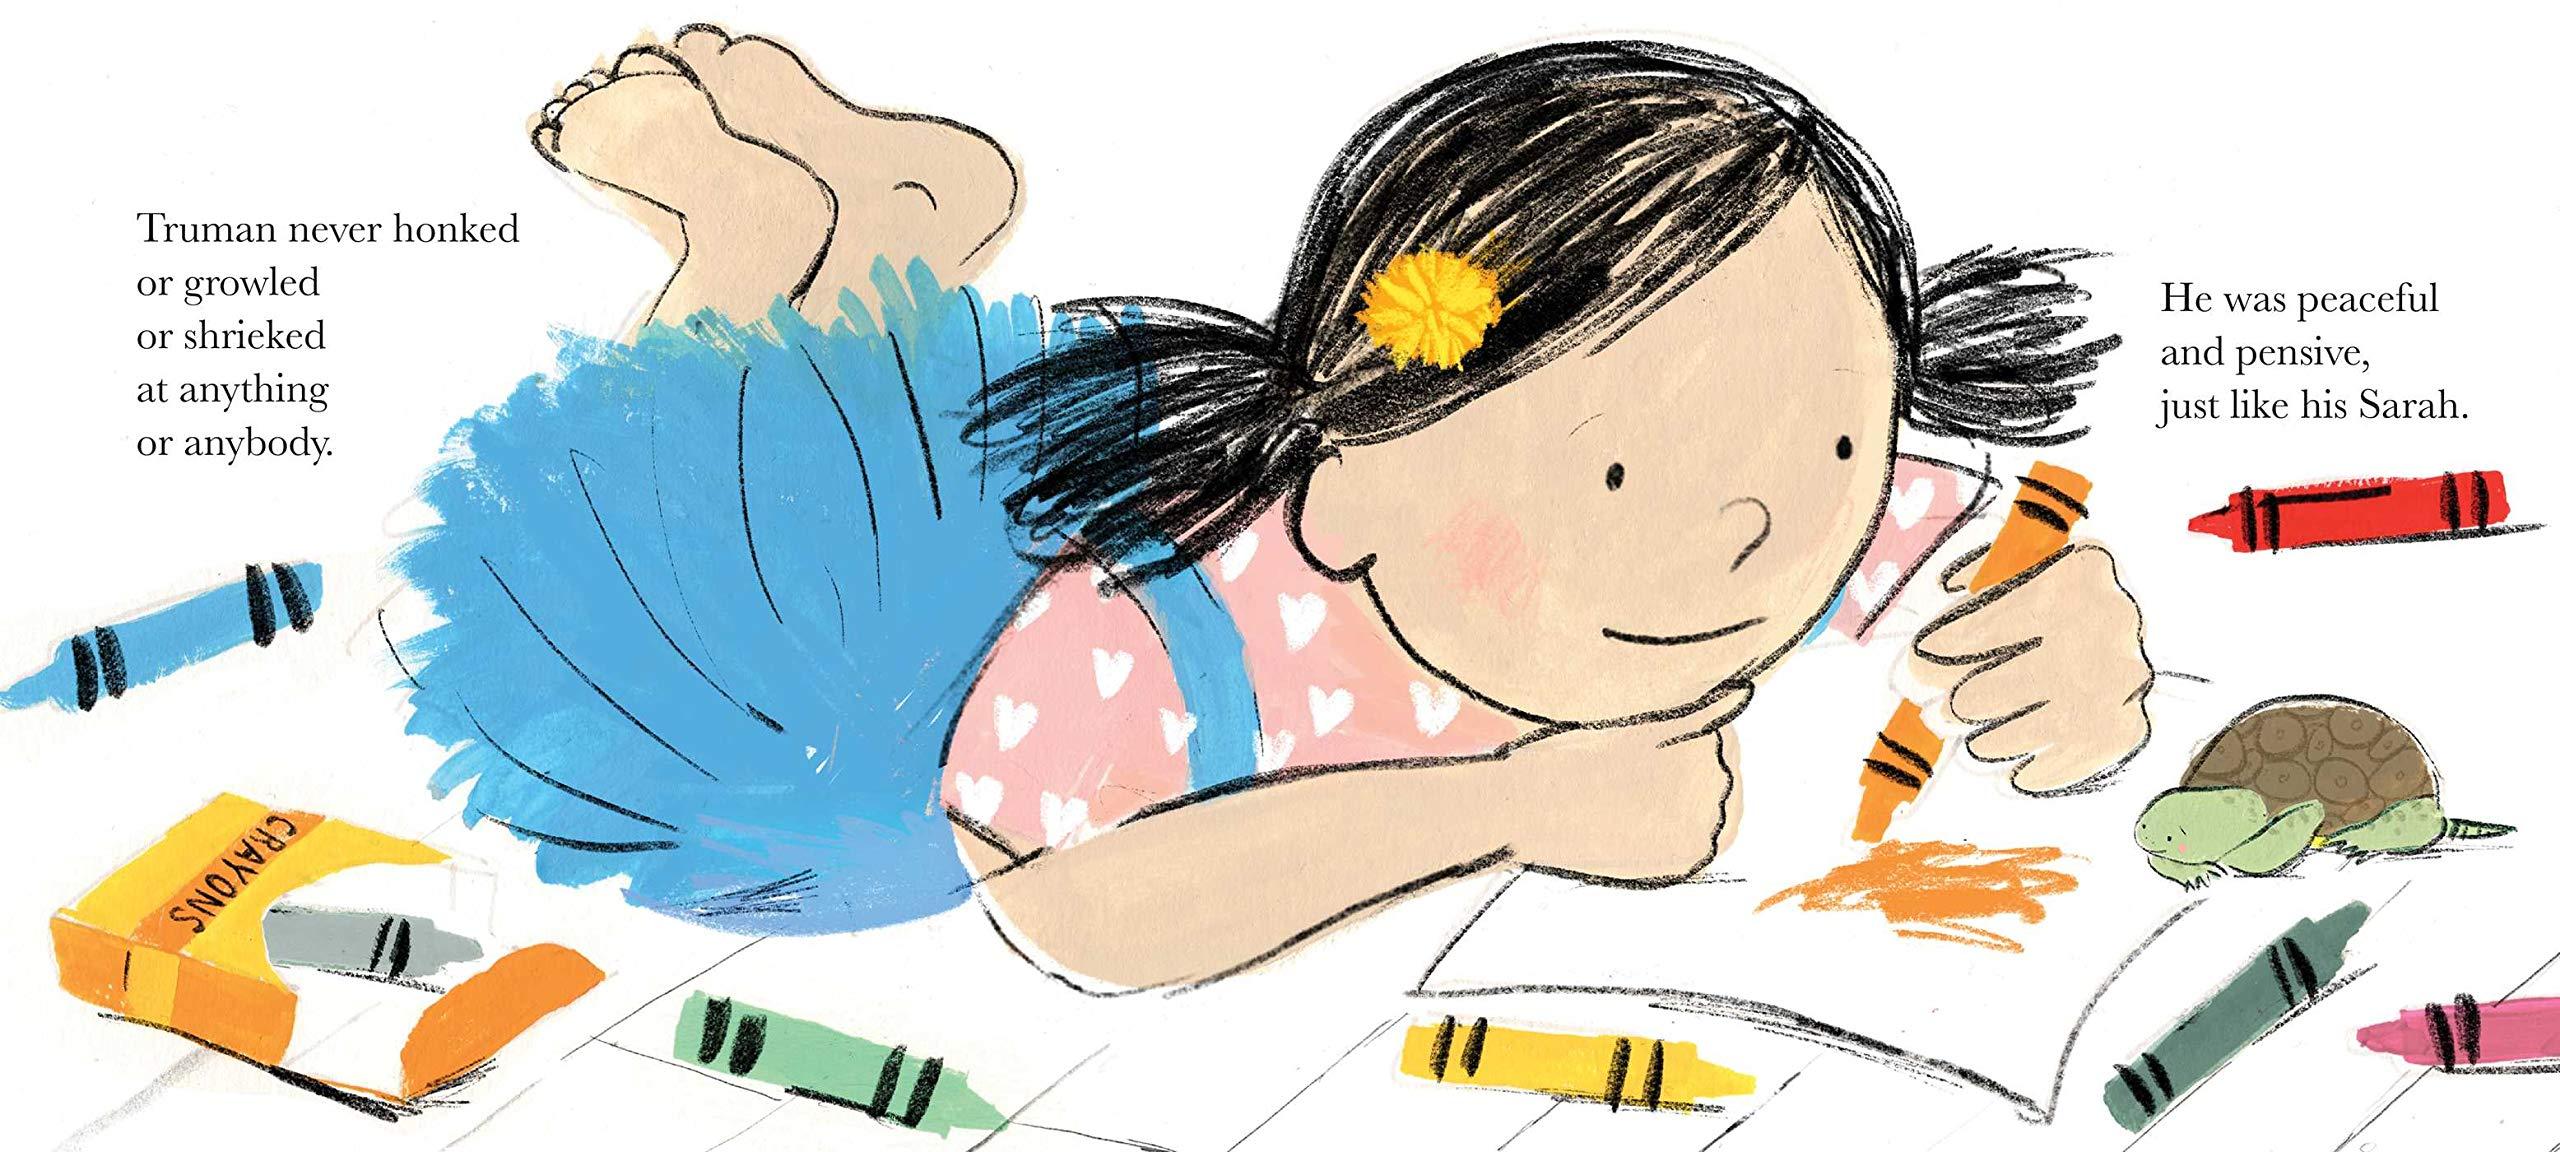 celebrate-picture-books-picture-book-review-truman-coloring